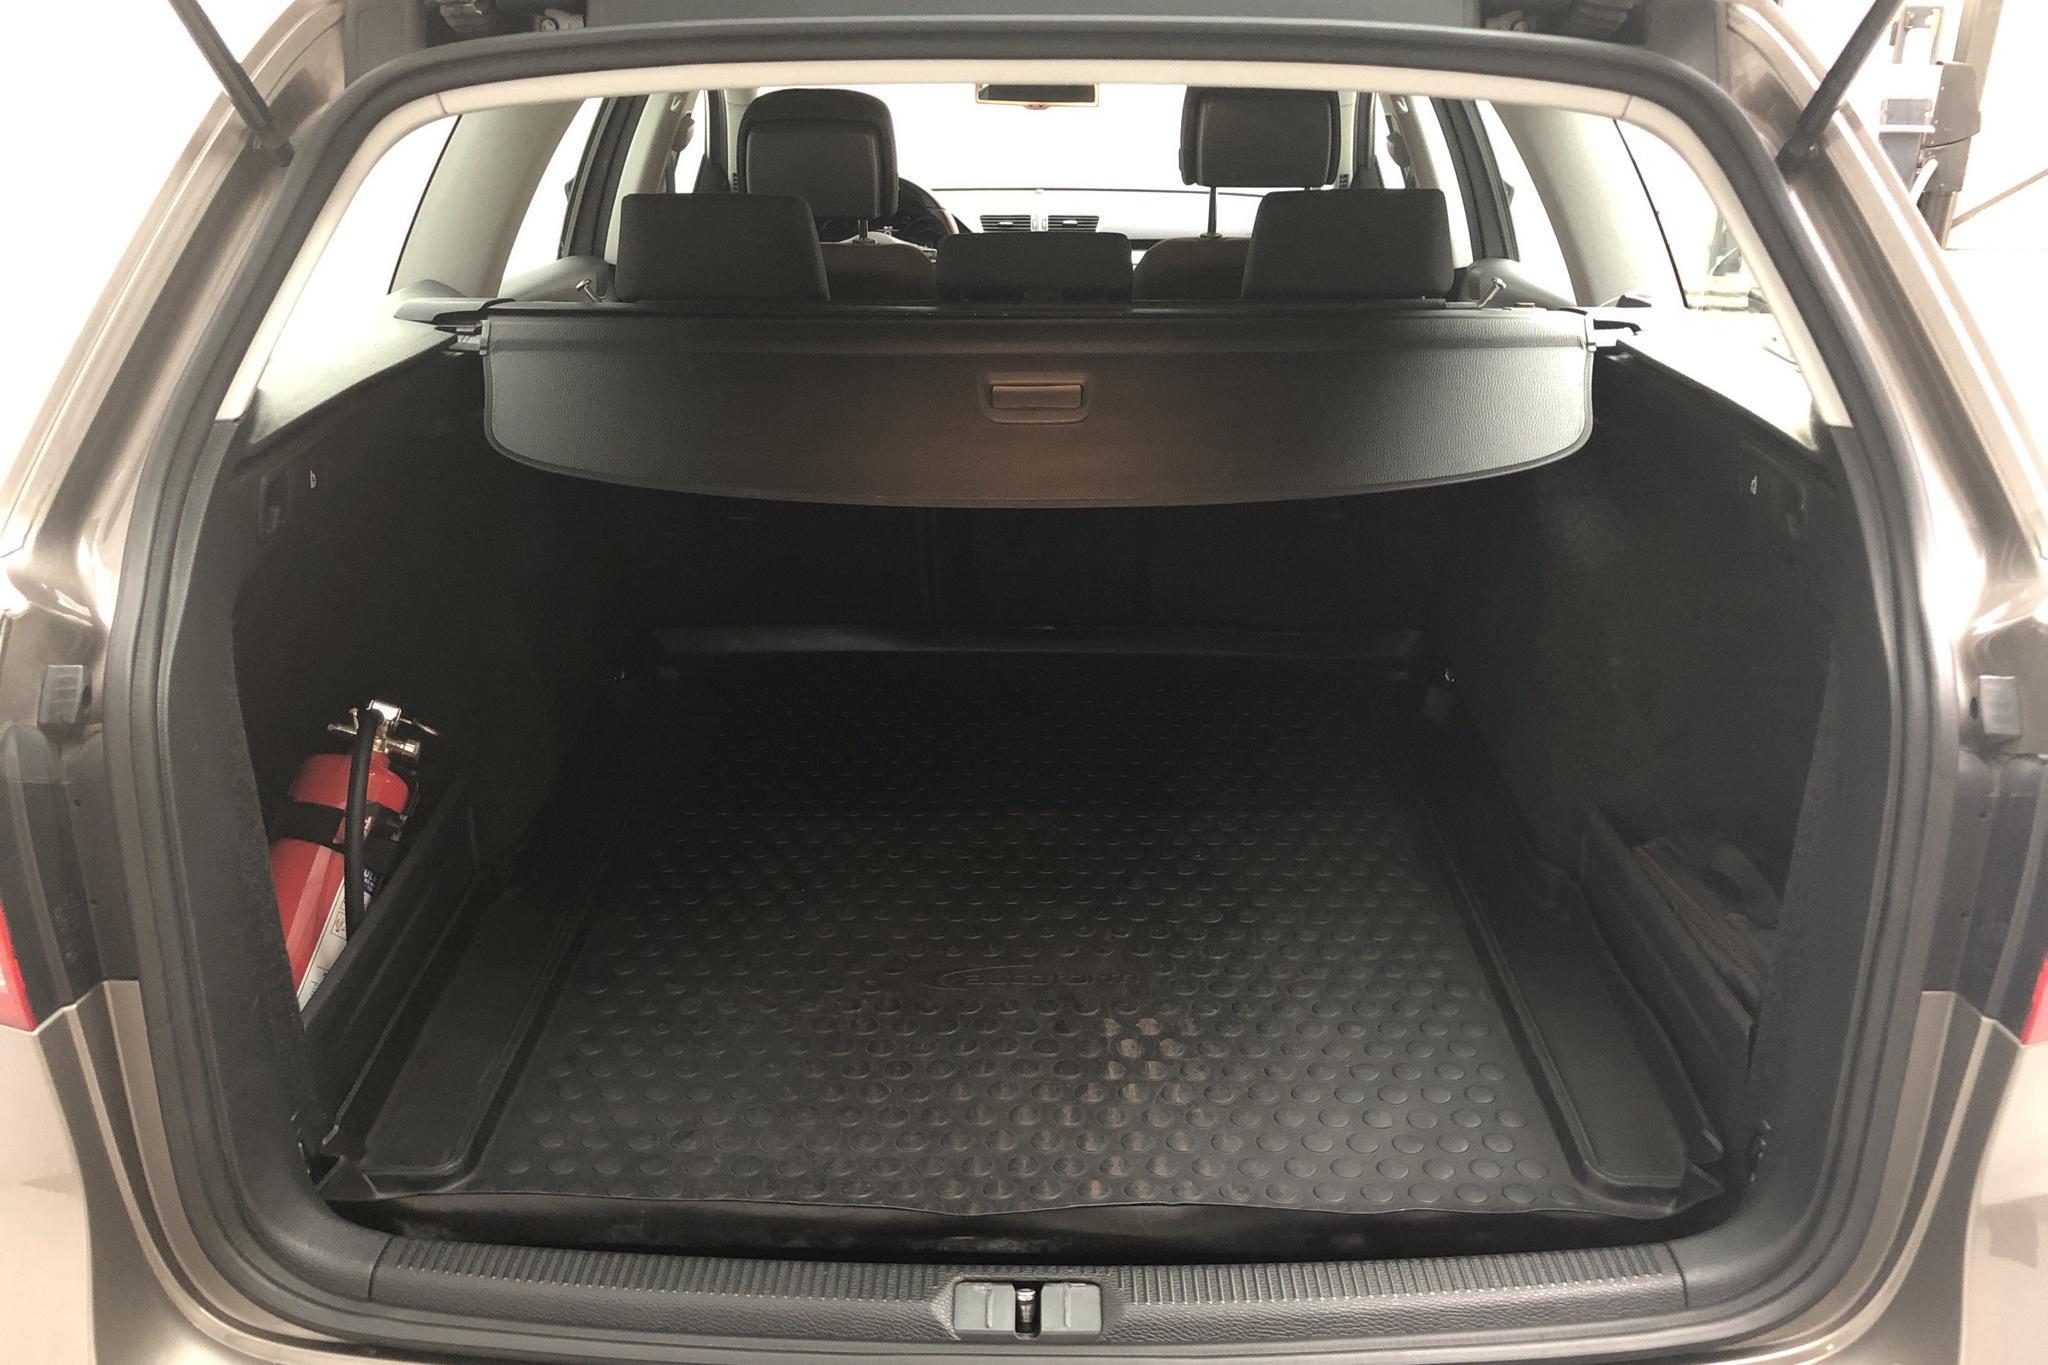 VW Passat 1.4 TSI EcoFuel Variant (150hk) - 12 547 mil - Automat - Light Brown - 2011